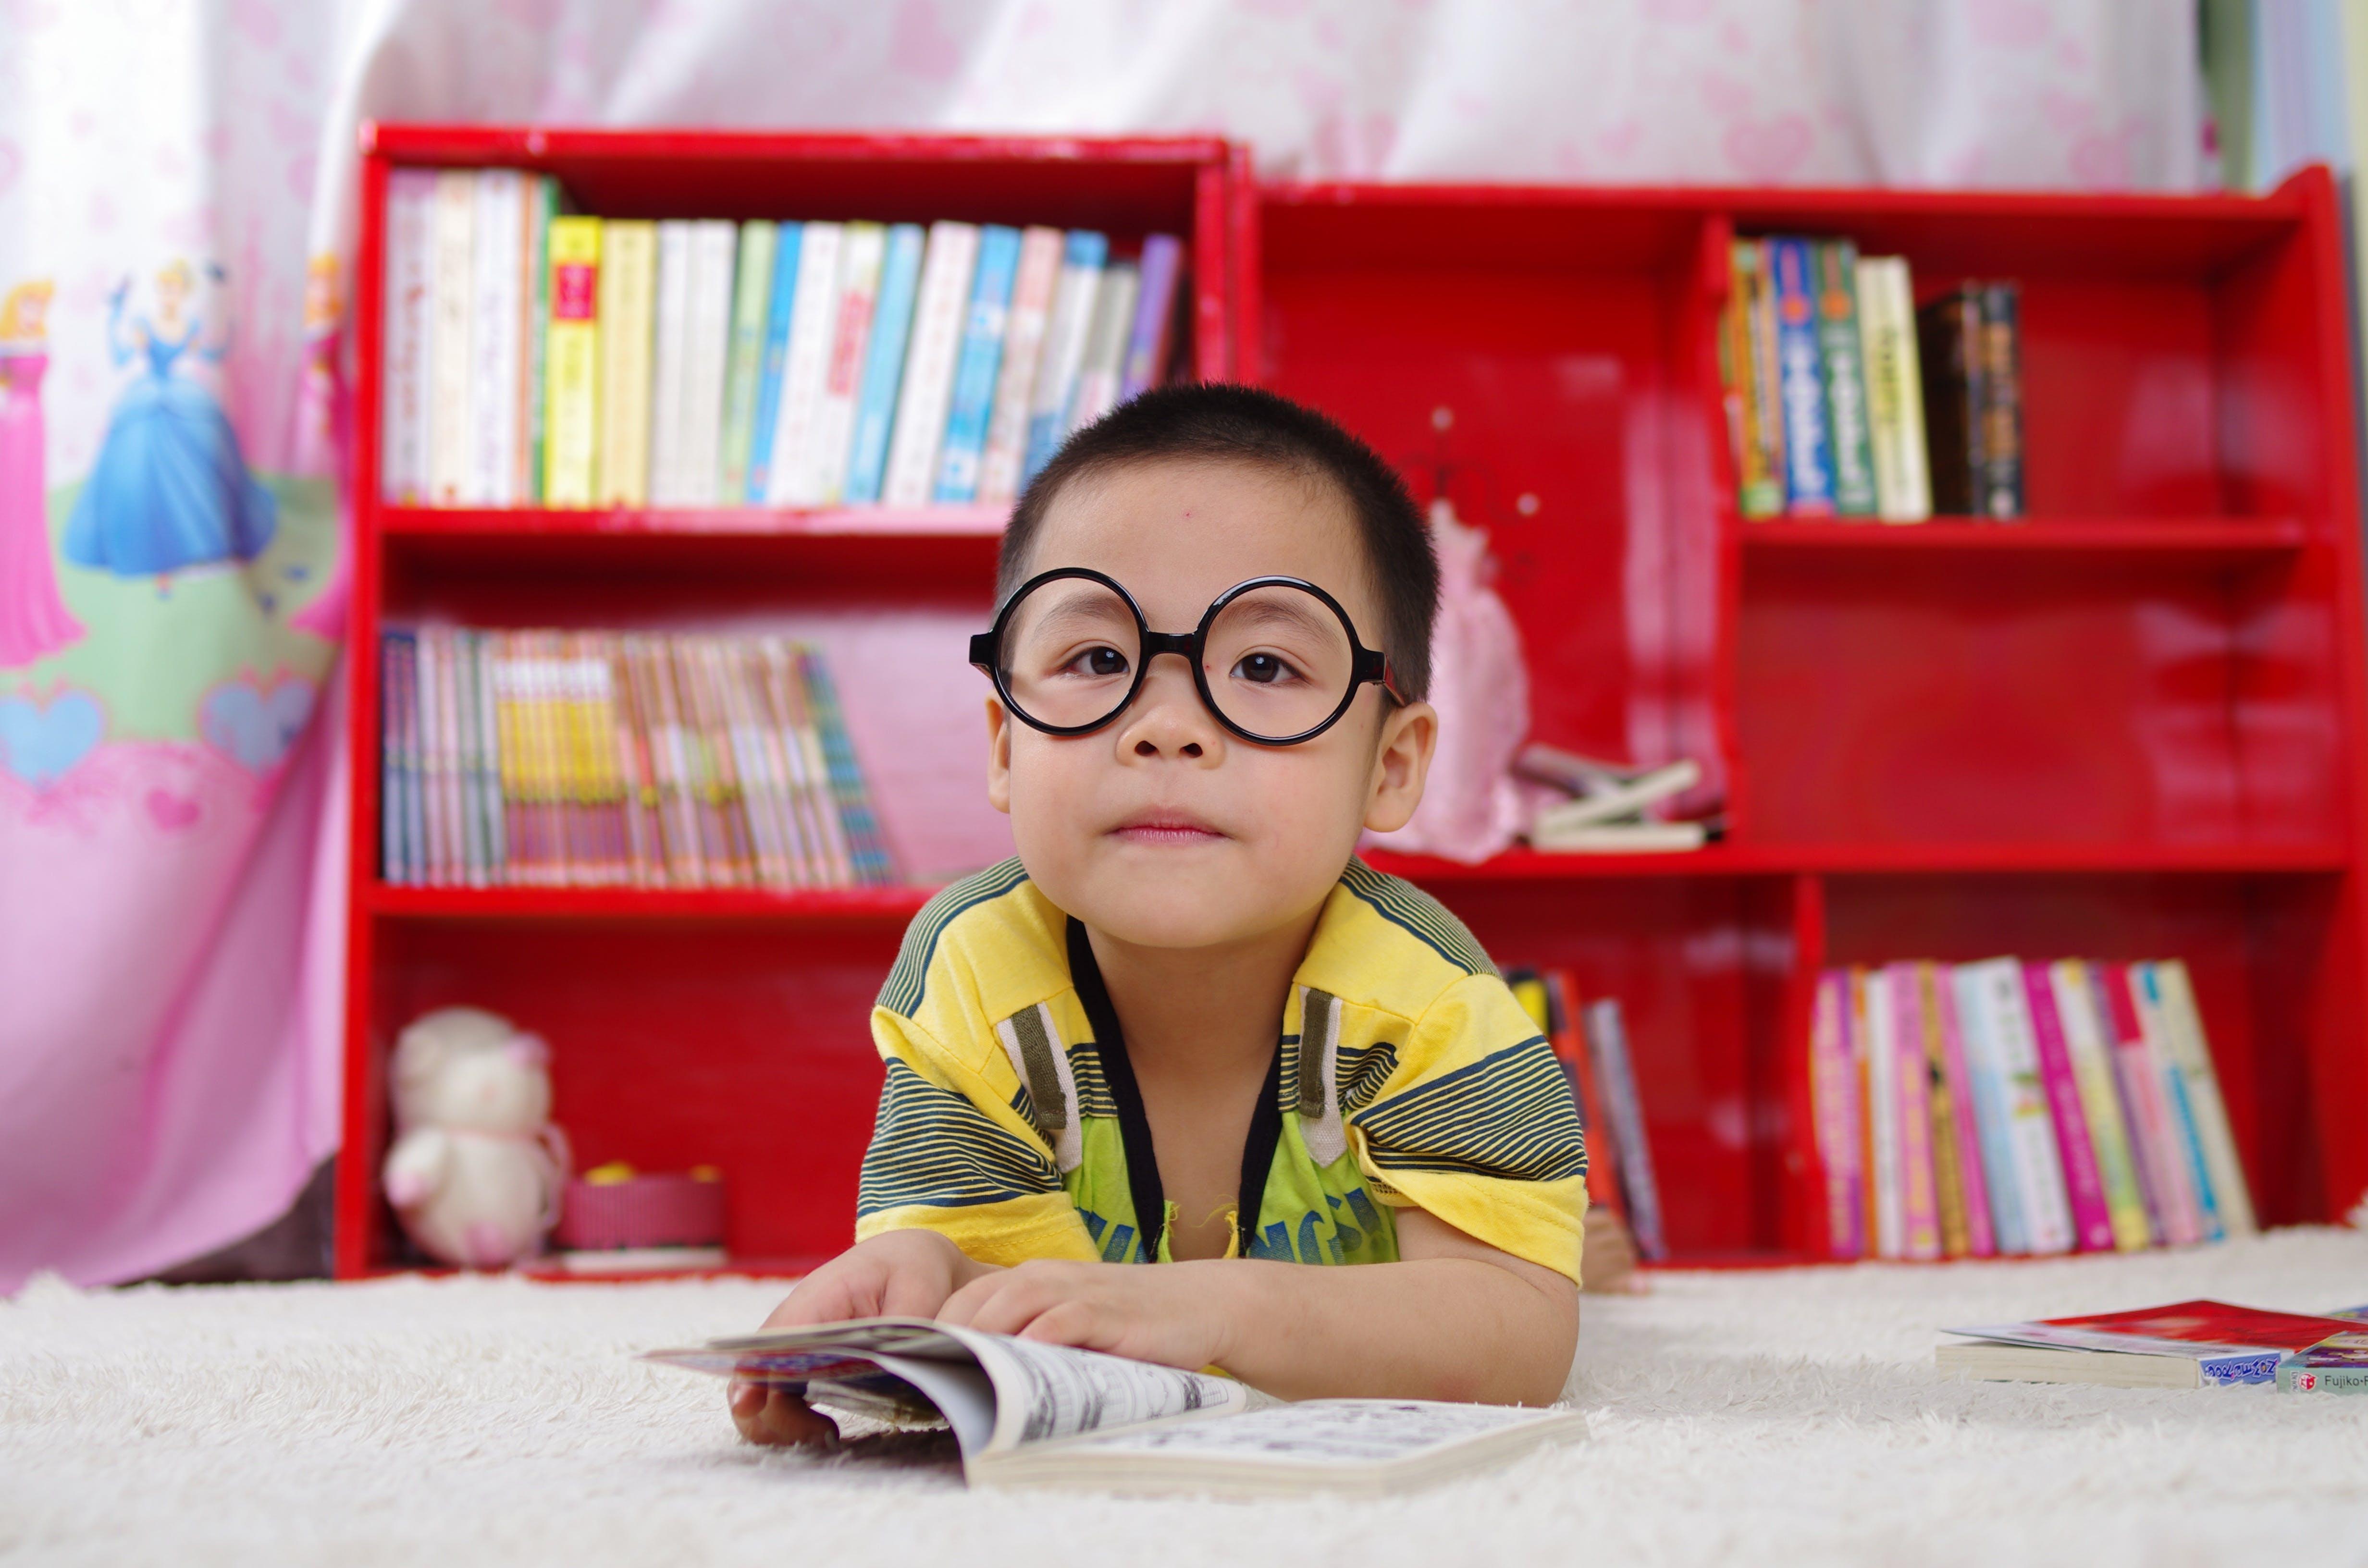 barn, bibliotek, bogreol